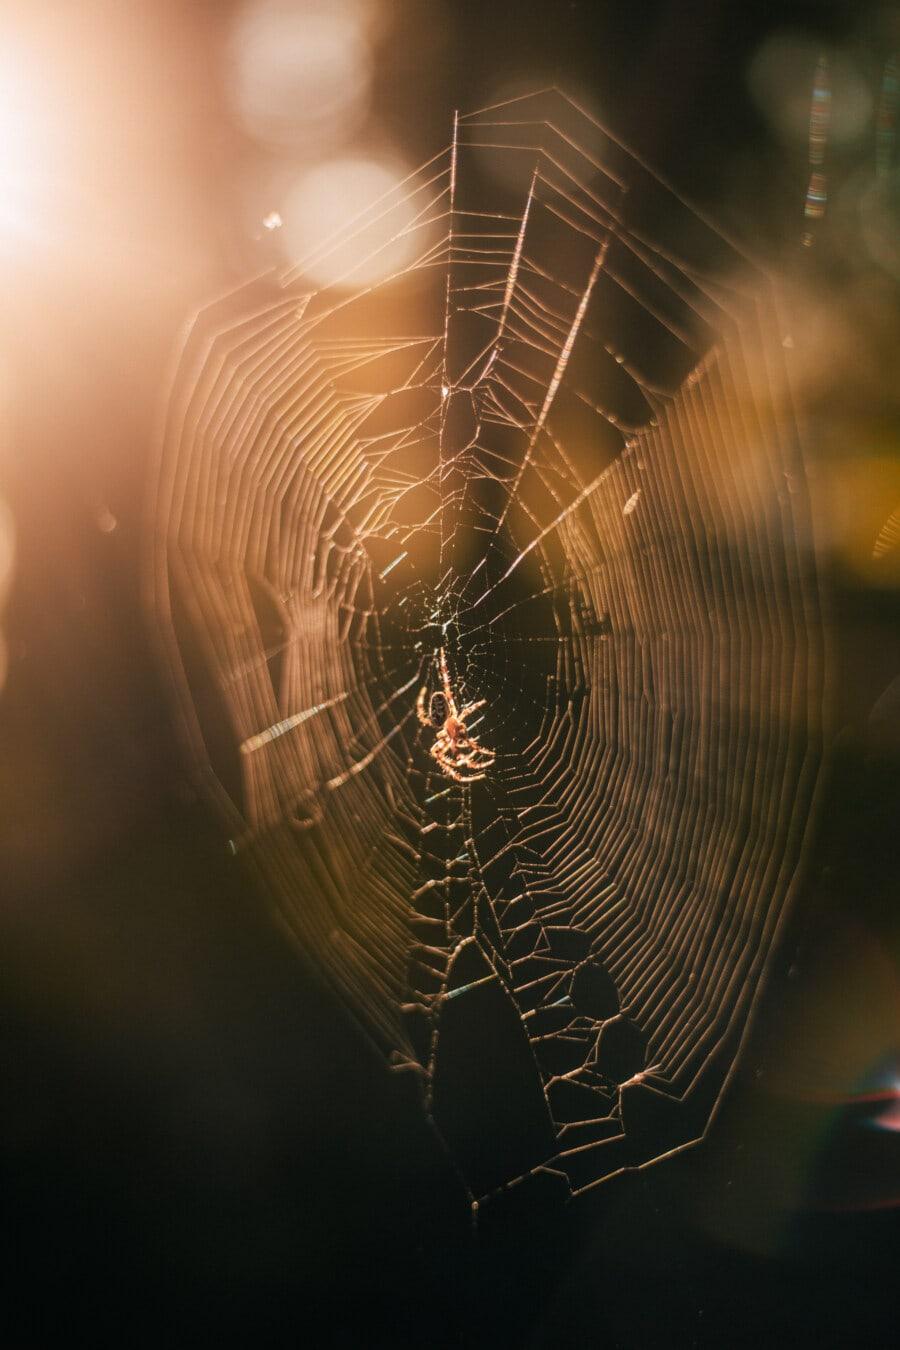 sunset, spider, spider web, sunlight, insect, bright, backlight, trap, cobweb, spiderweb